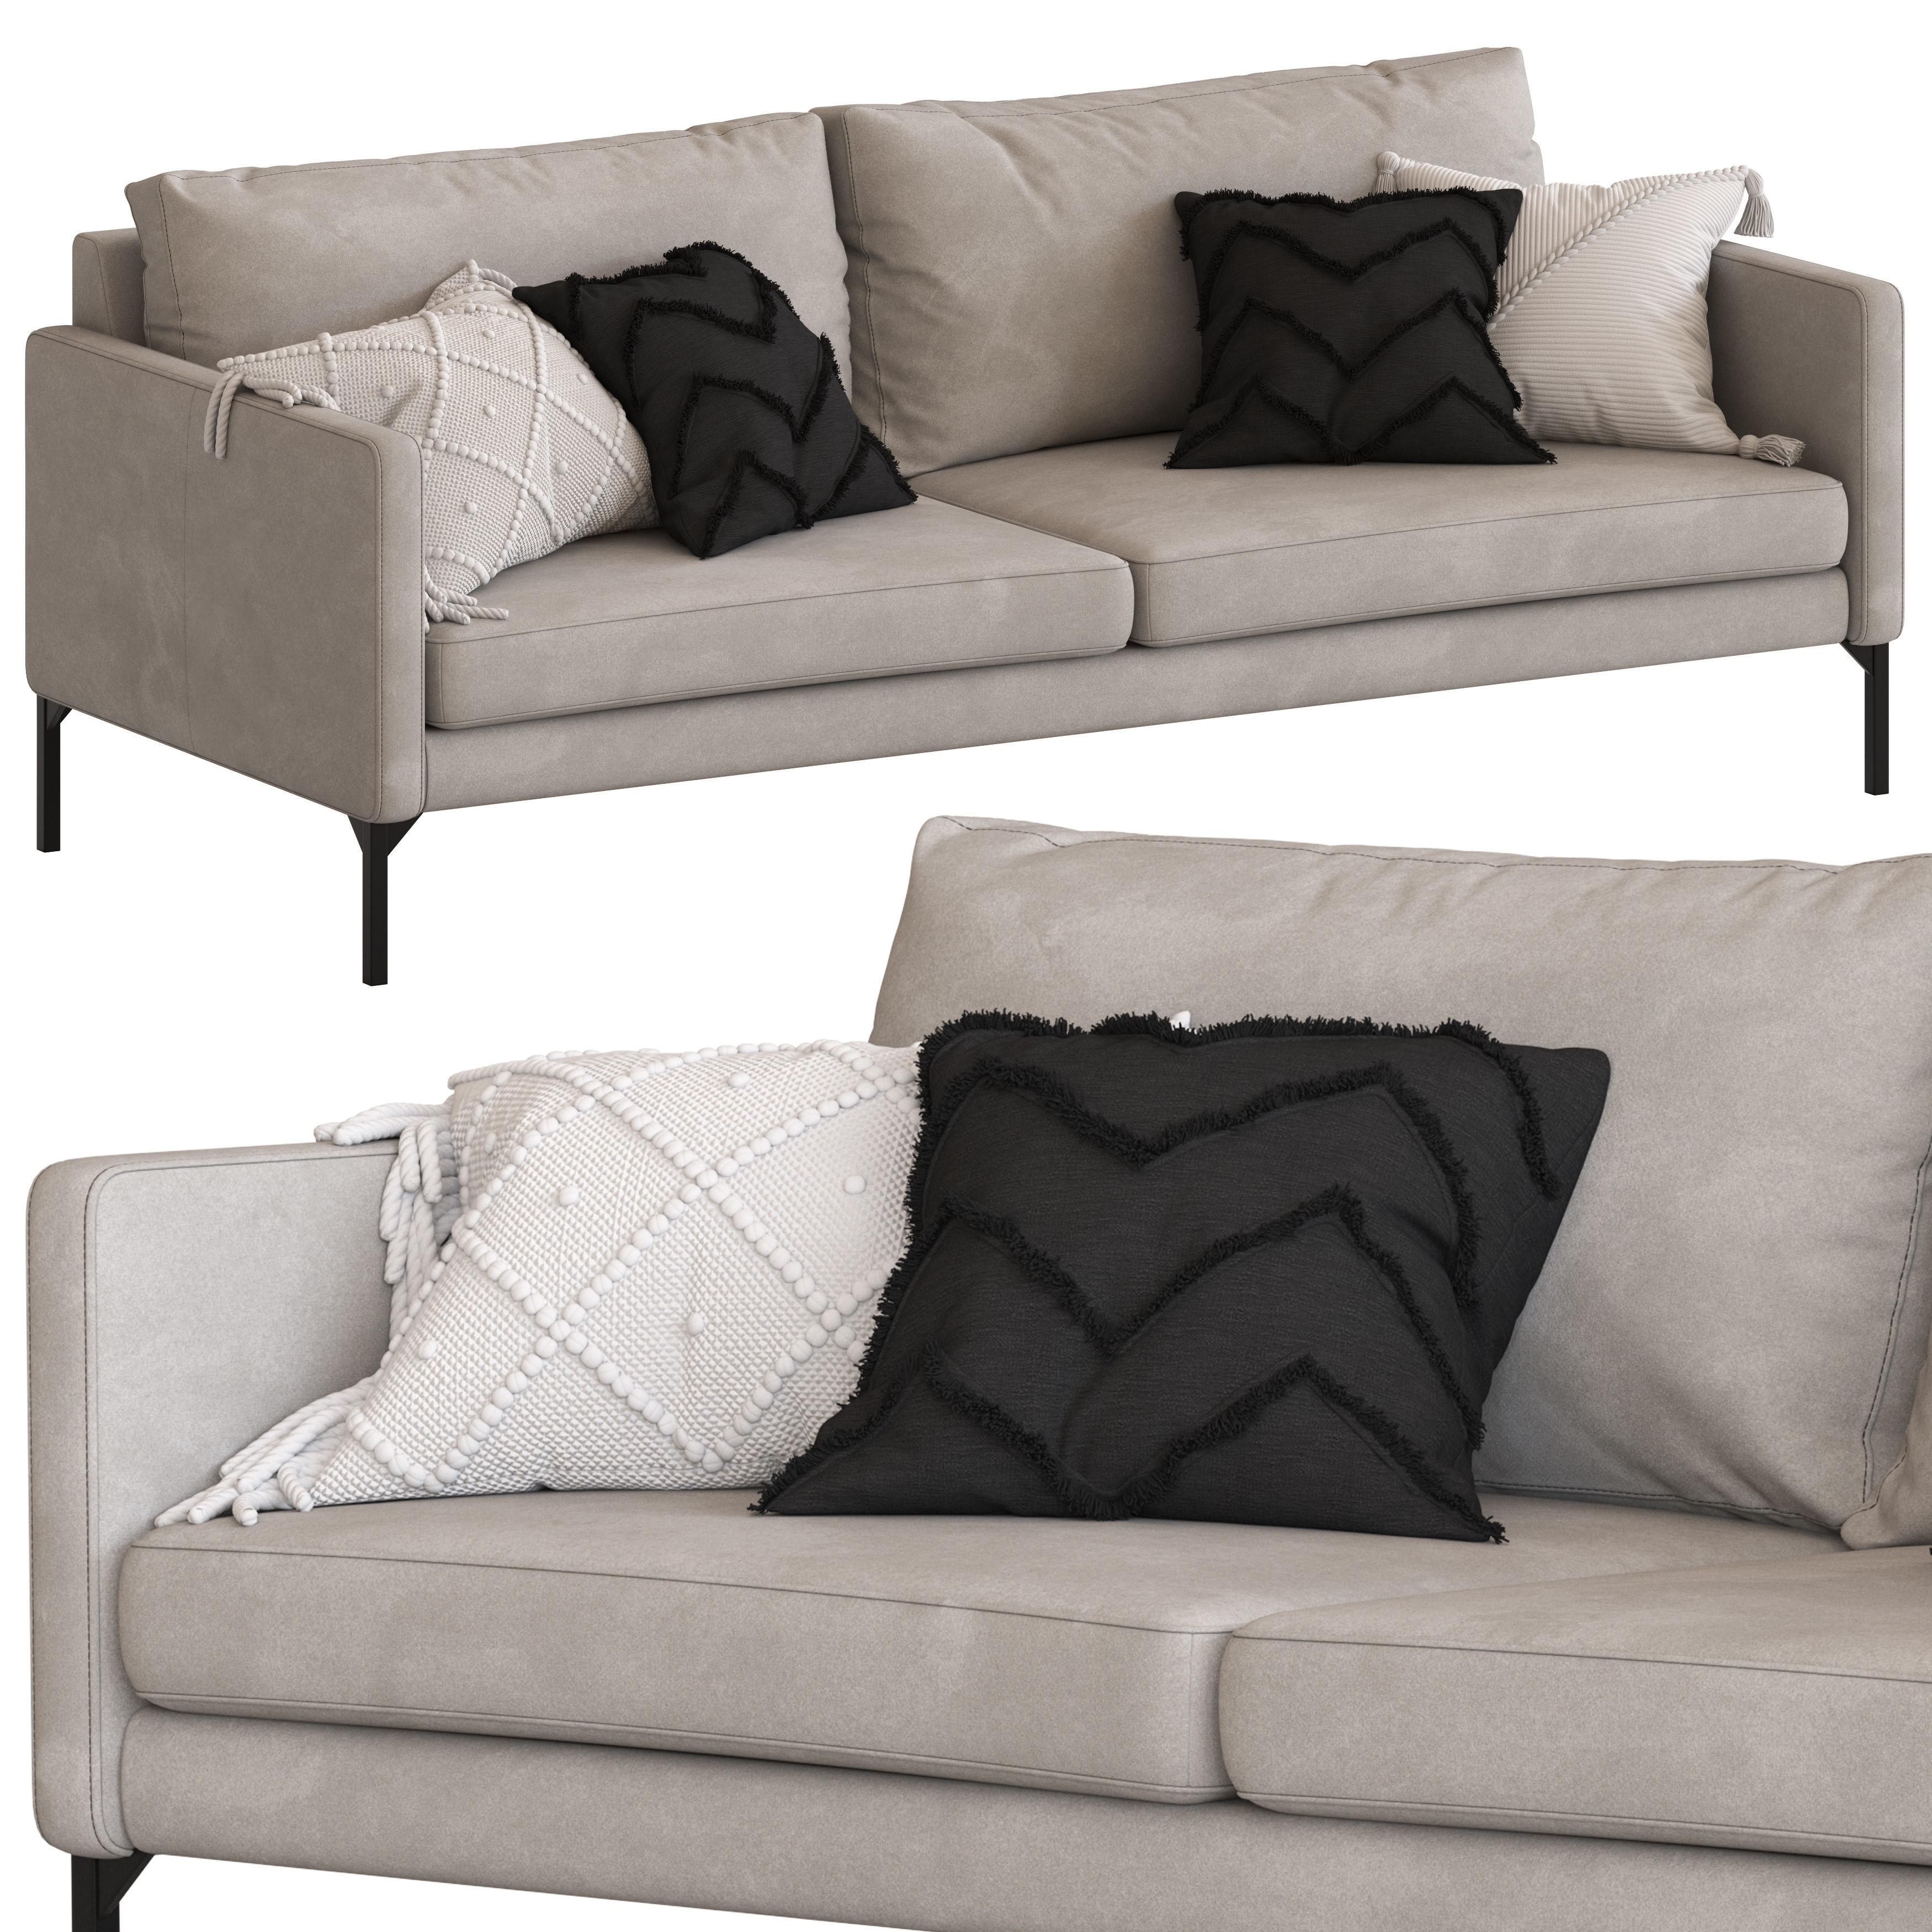 Globewest Bogart 3 Seater Sofa Model